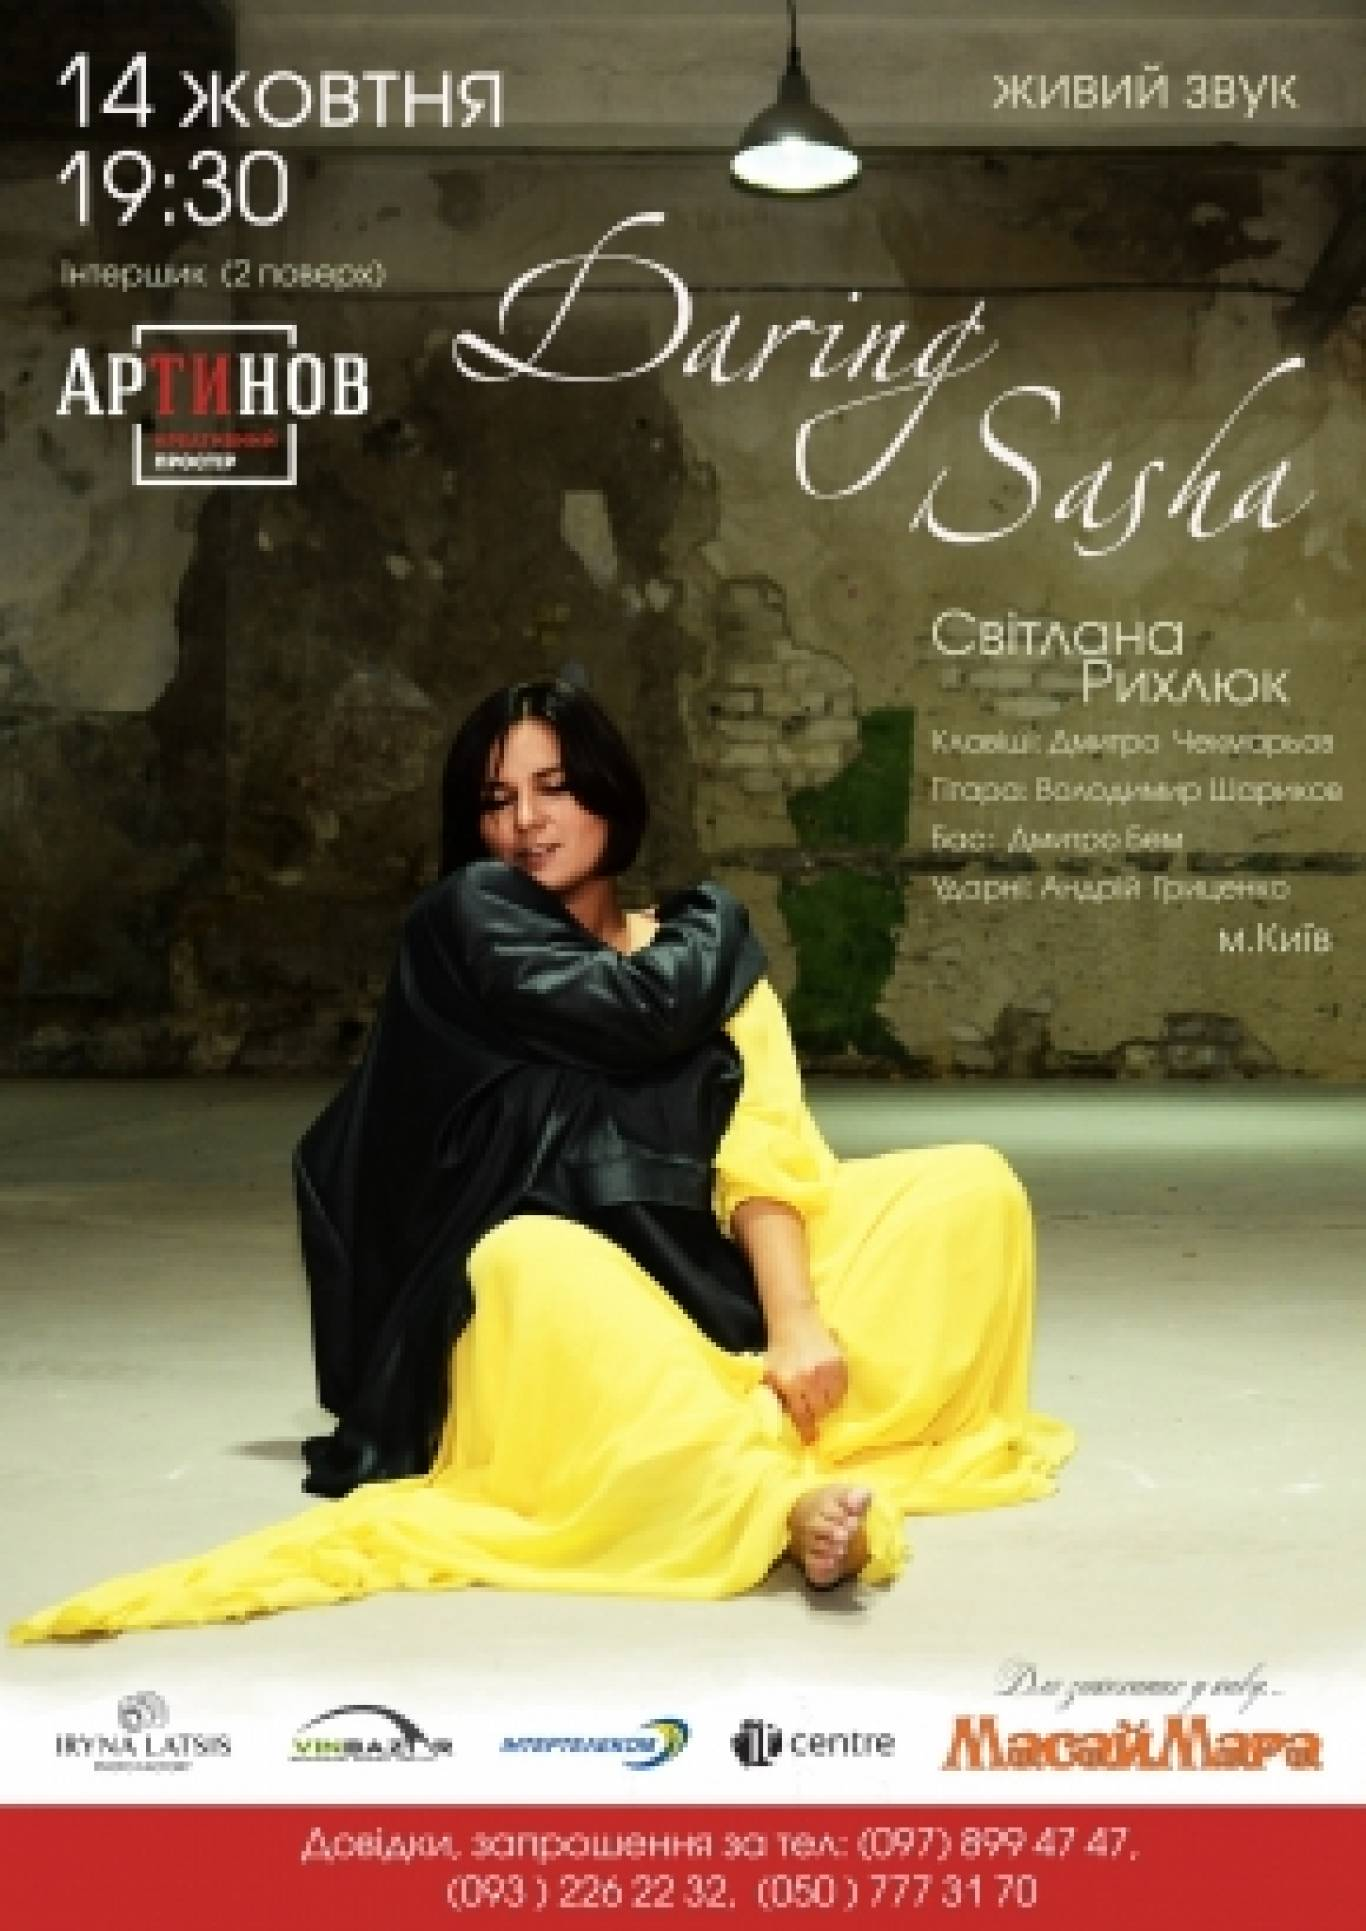 Концерт Daring Sasha (Светлана Рихлюк)